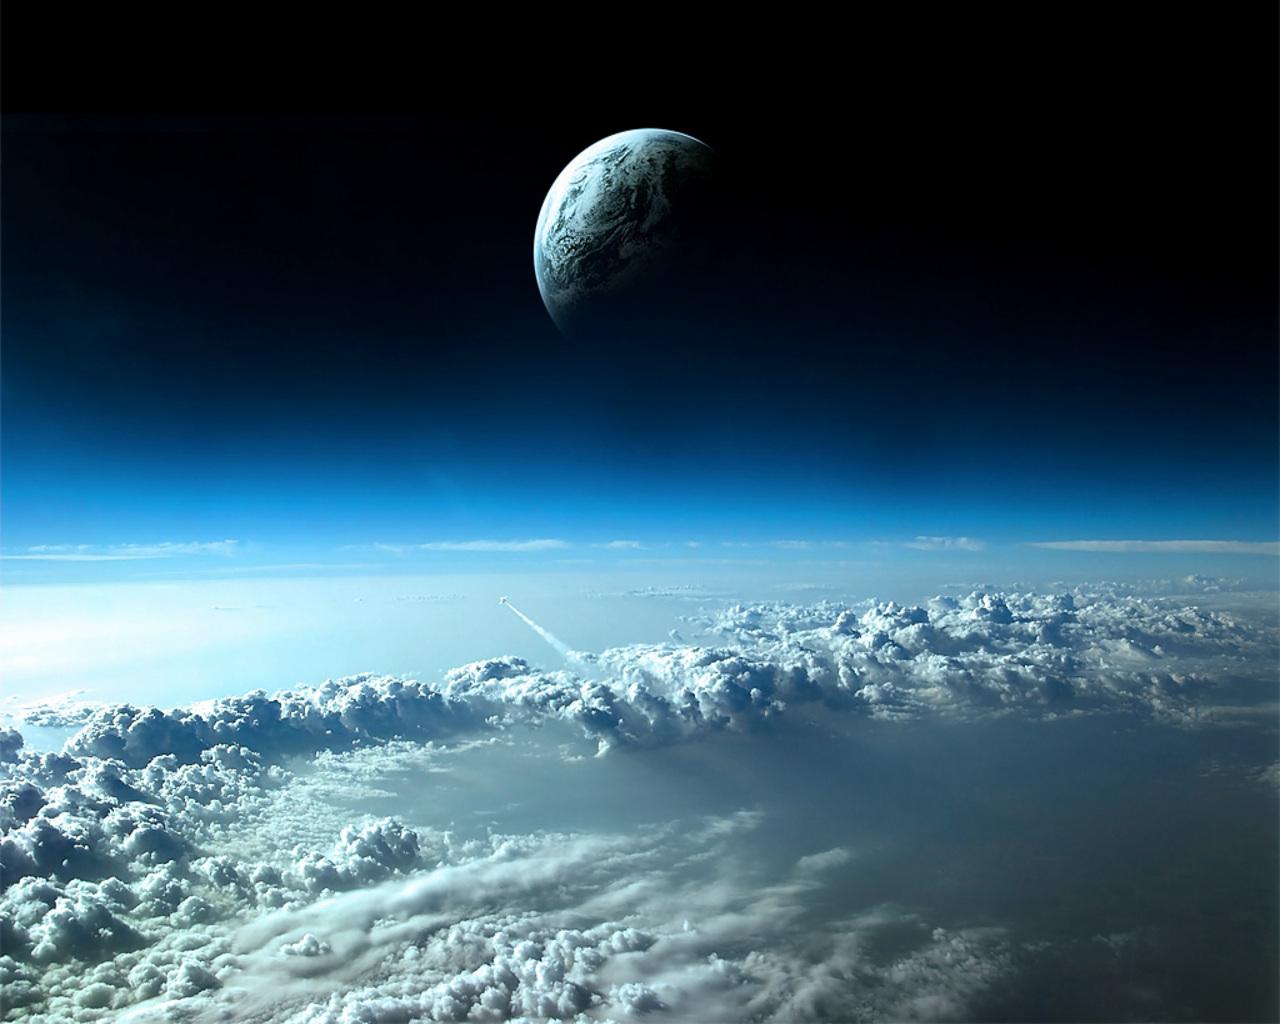 http://1.bp.blogspot.com/-6fBaRM9aSEA/UHEqspdMq3I/AAAAAAAAG5Y/3pfKhnWGopY/s1600/5410_3d_space_scene_hd_wallpapers.jpg